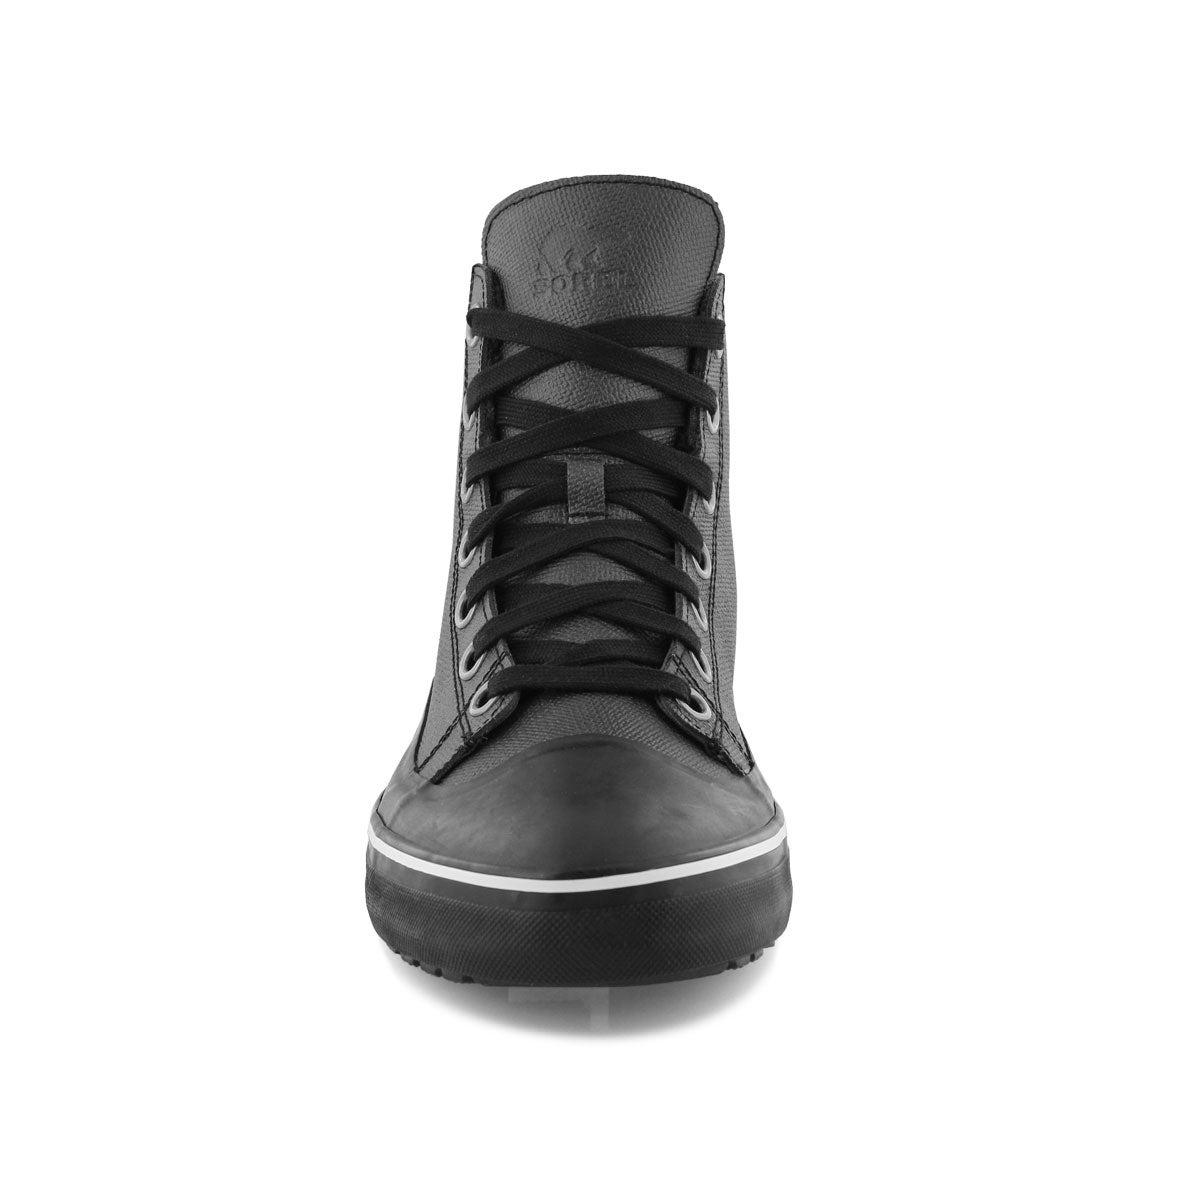 Mns Cheyanne Metro Hi black wtpf boot